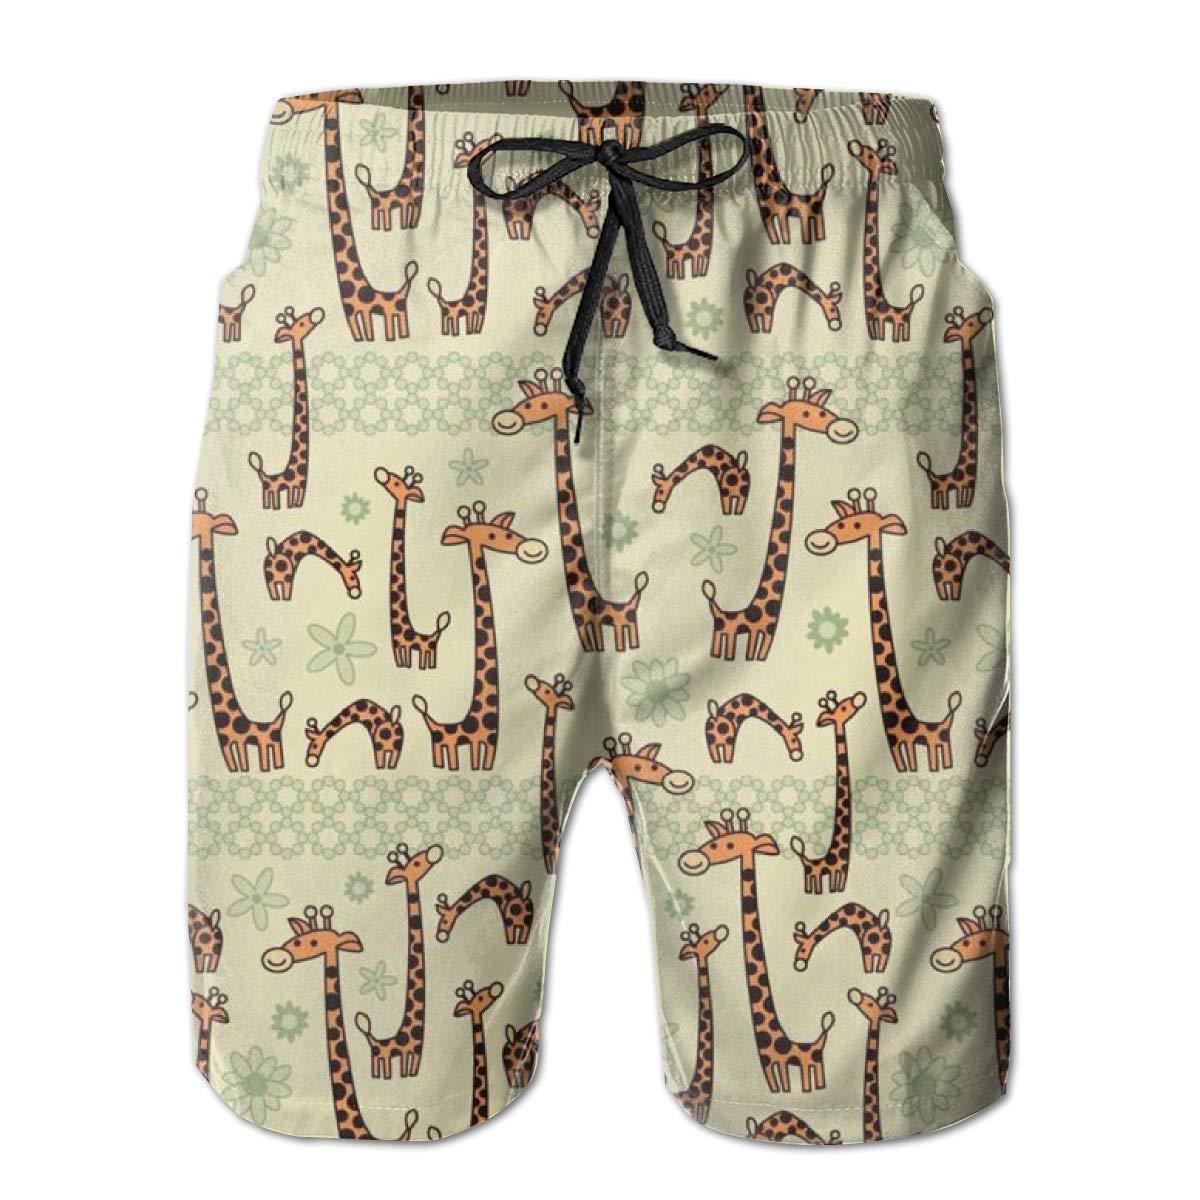 FASUWAVE Mens Swim Trunks Cute Girafee Quick Dry Beach Board Shorts with Mesh Lining